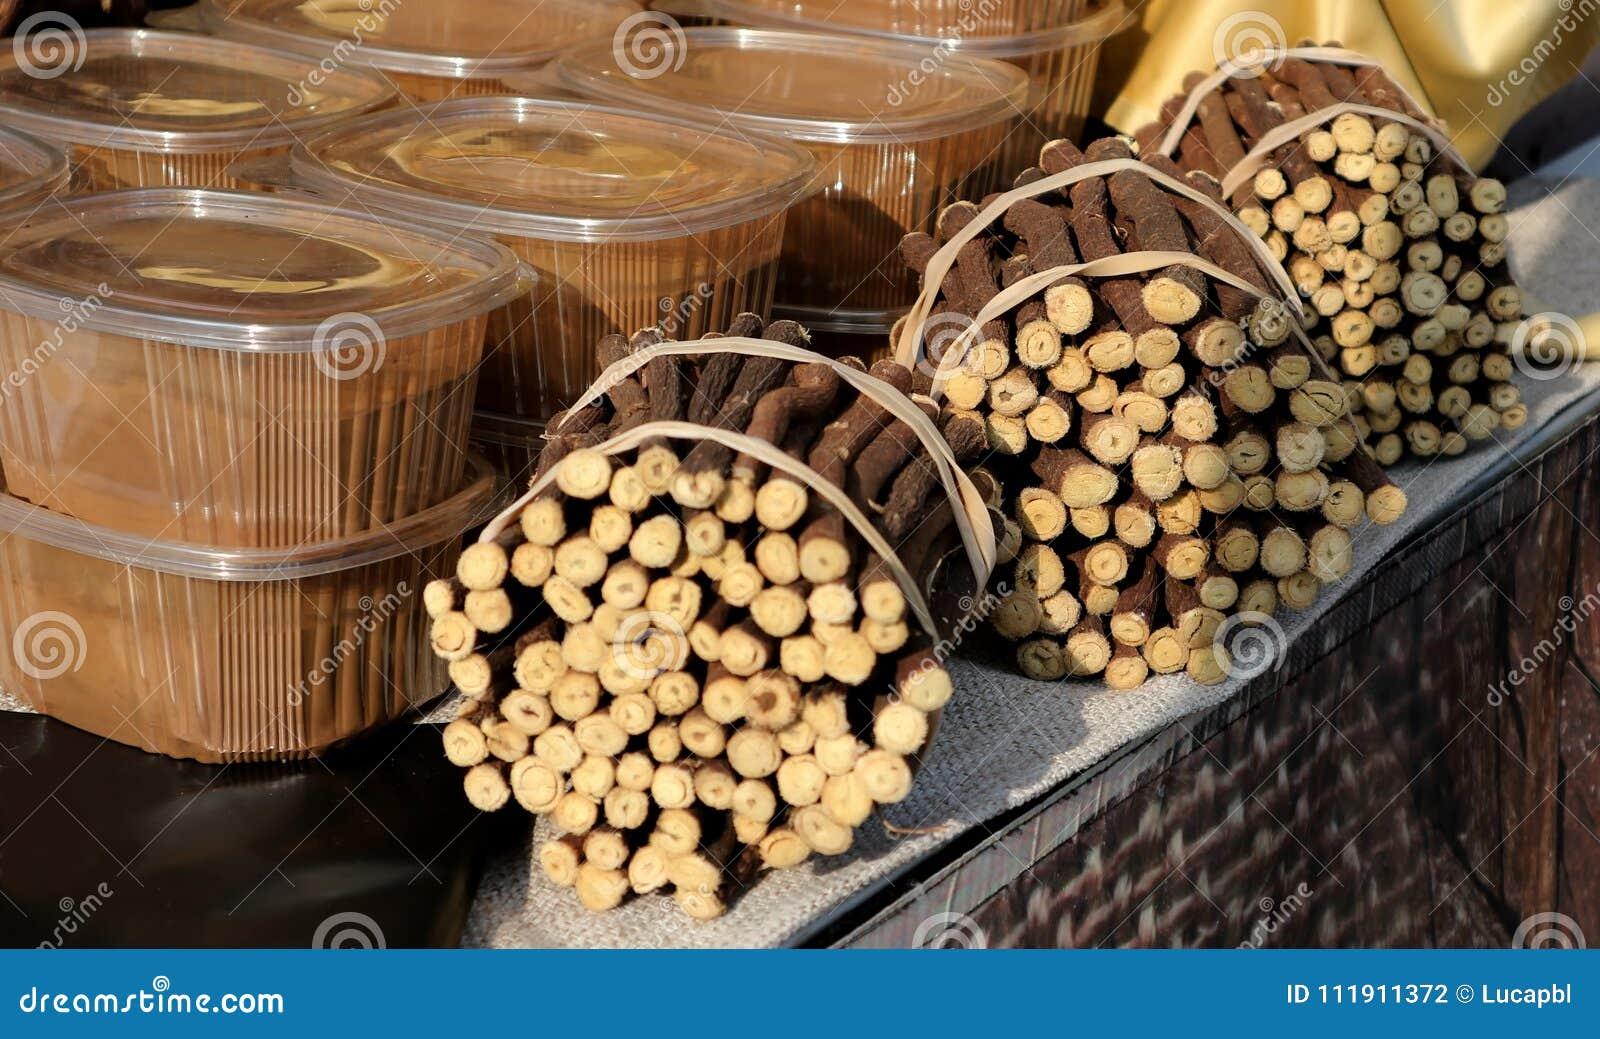 Licorice ρίζες που δένονται και διαφανή εμπορευματοκιβώτια liquorice του εκχυλίσματος Αφιερωμένο ράφι σε μια τοπική αγορά